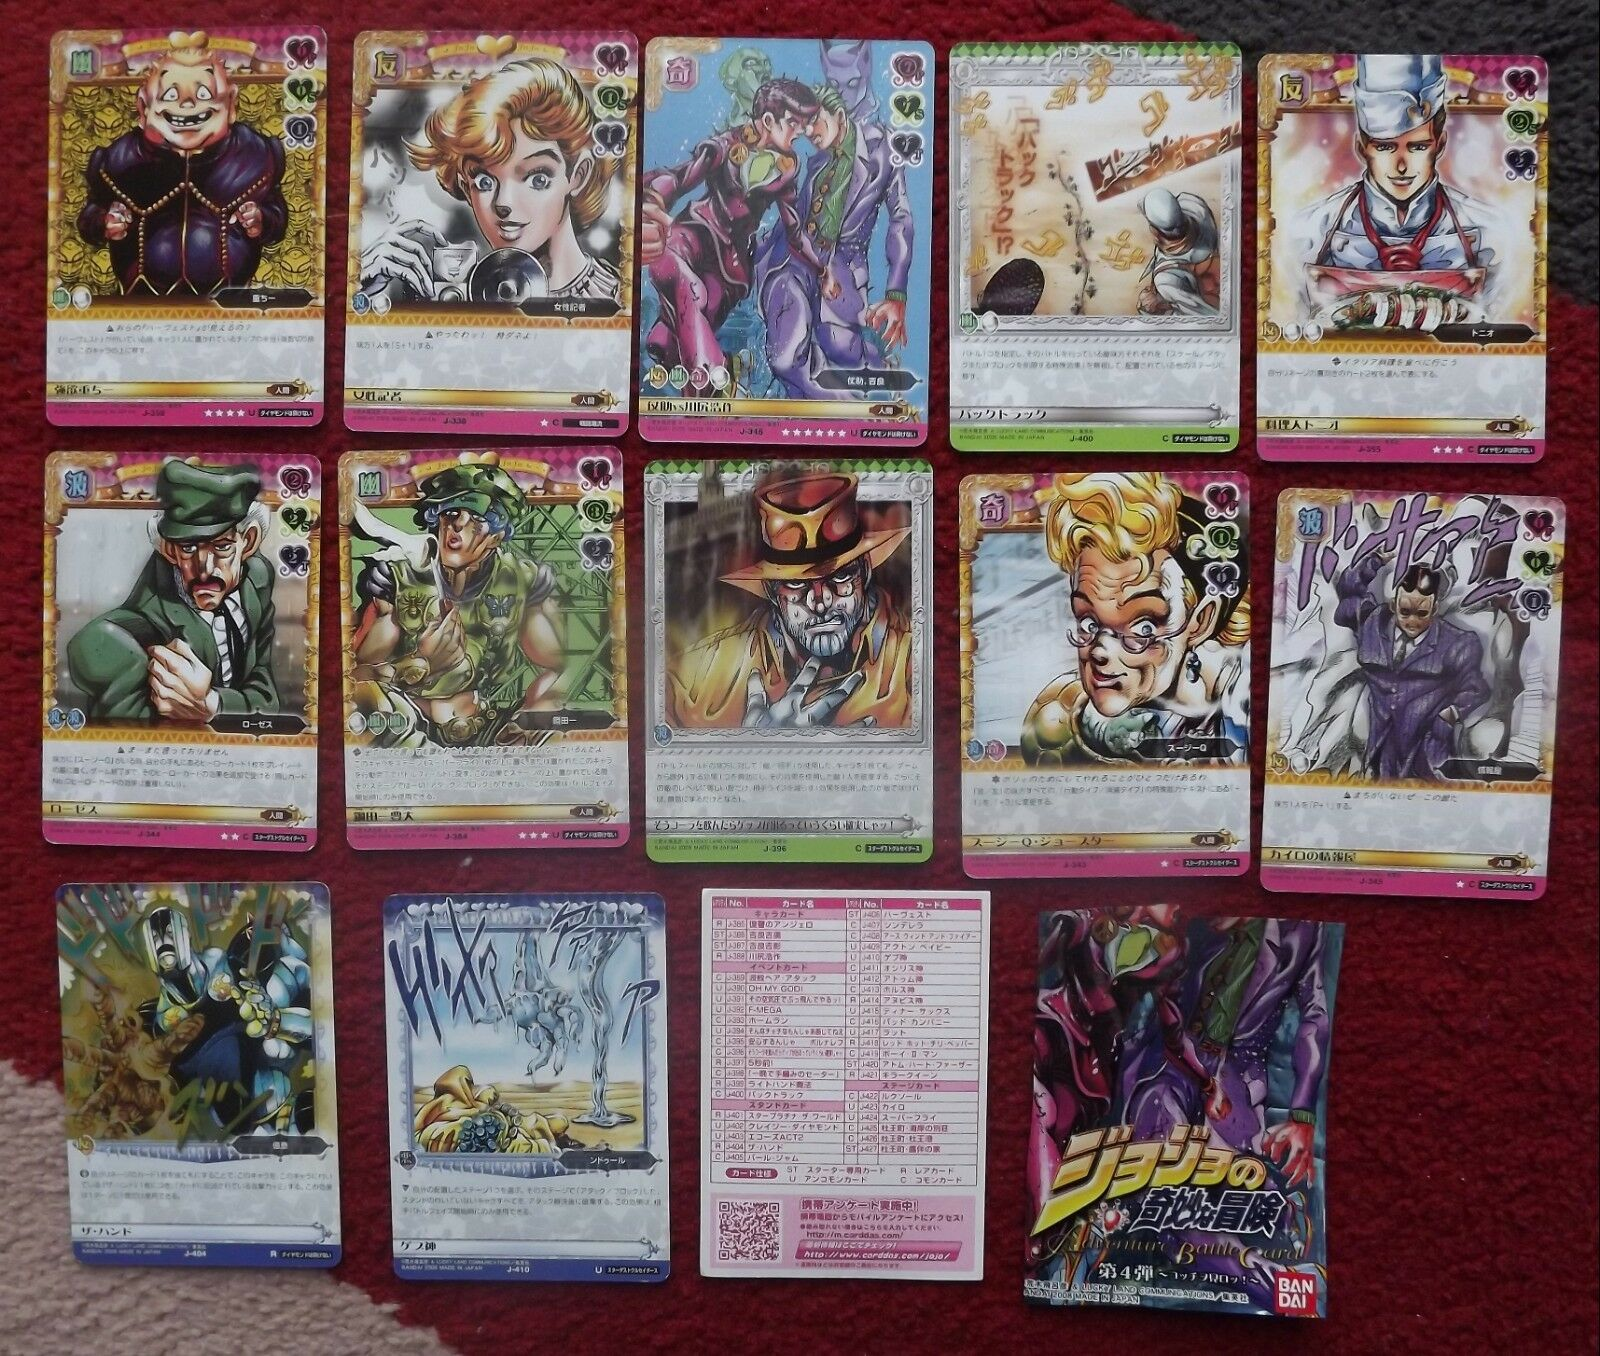 Jojo's Bizarre Adventure Battle Card 10x